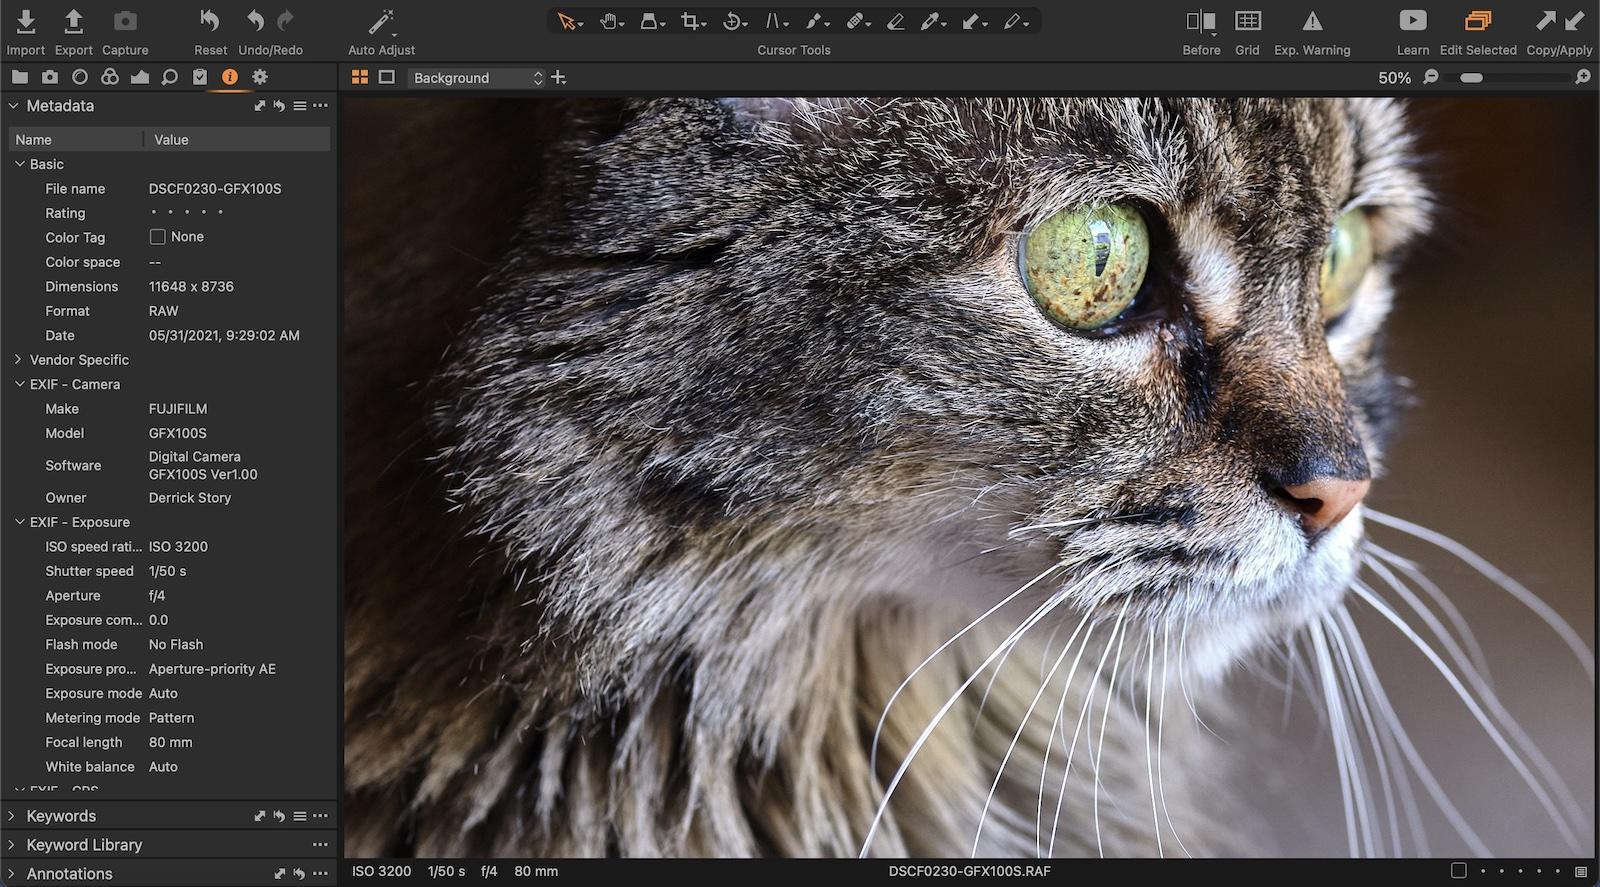 https://thedigitalstory.com/2021/06/01/cat-portrait-GFX100S-1600.jpg